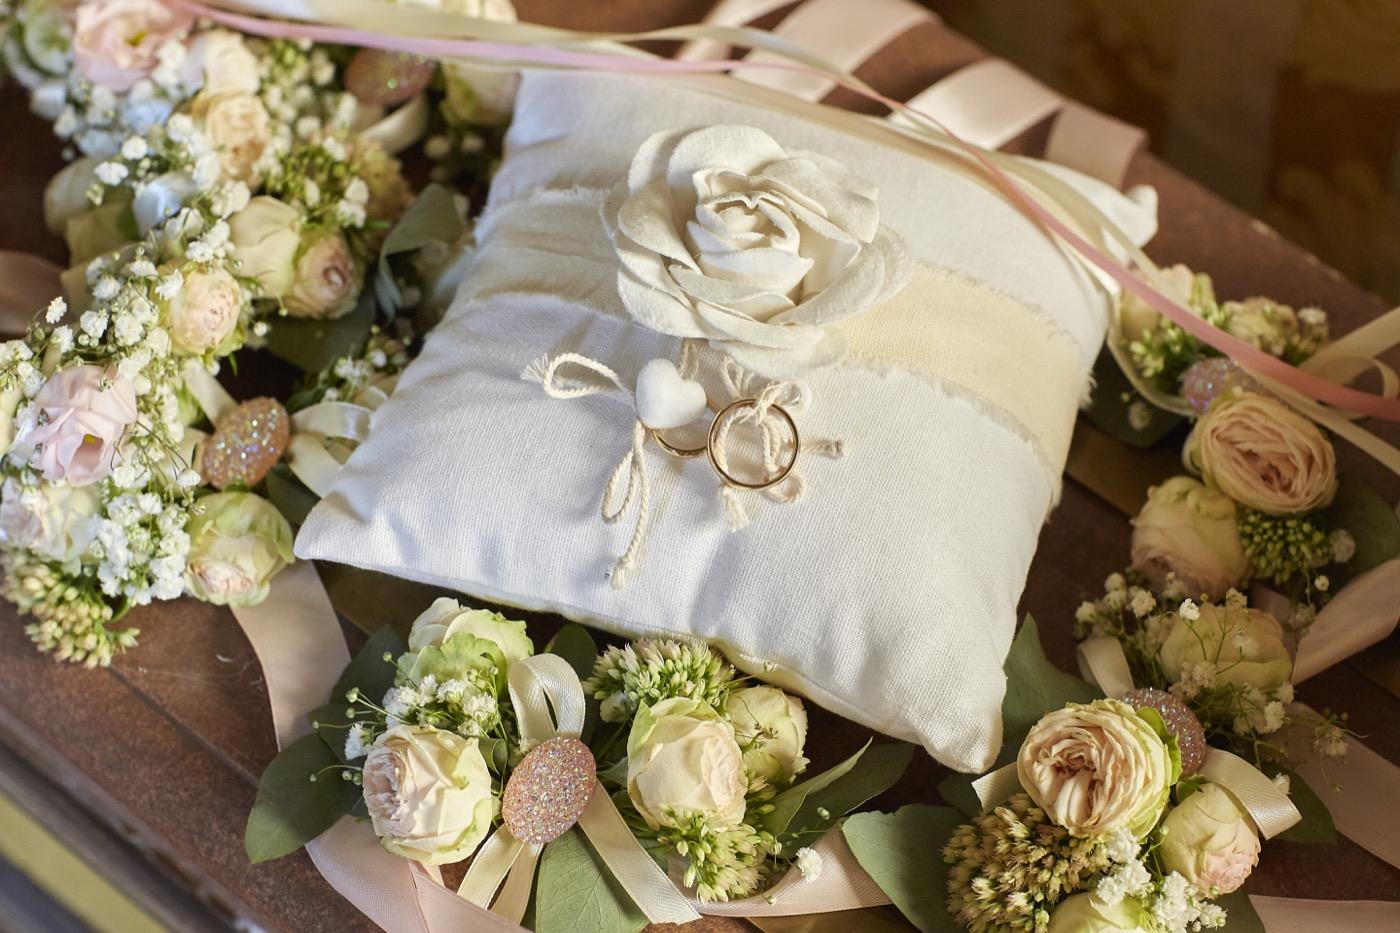 Claudio-Coppola-wedding-photographer-la-scuderia-eventi-preparativi-la-rosetta-perugia-24